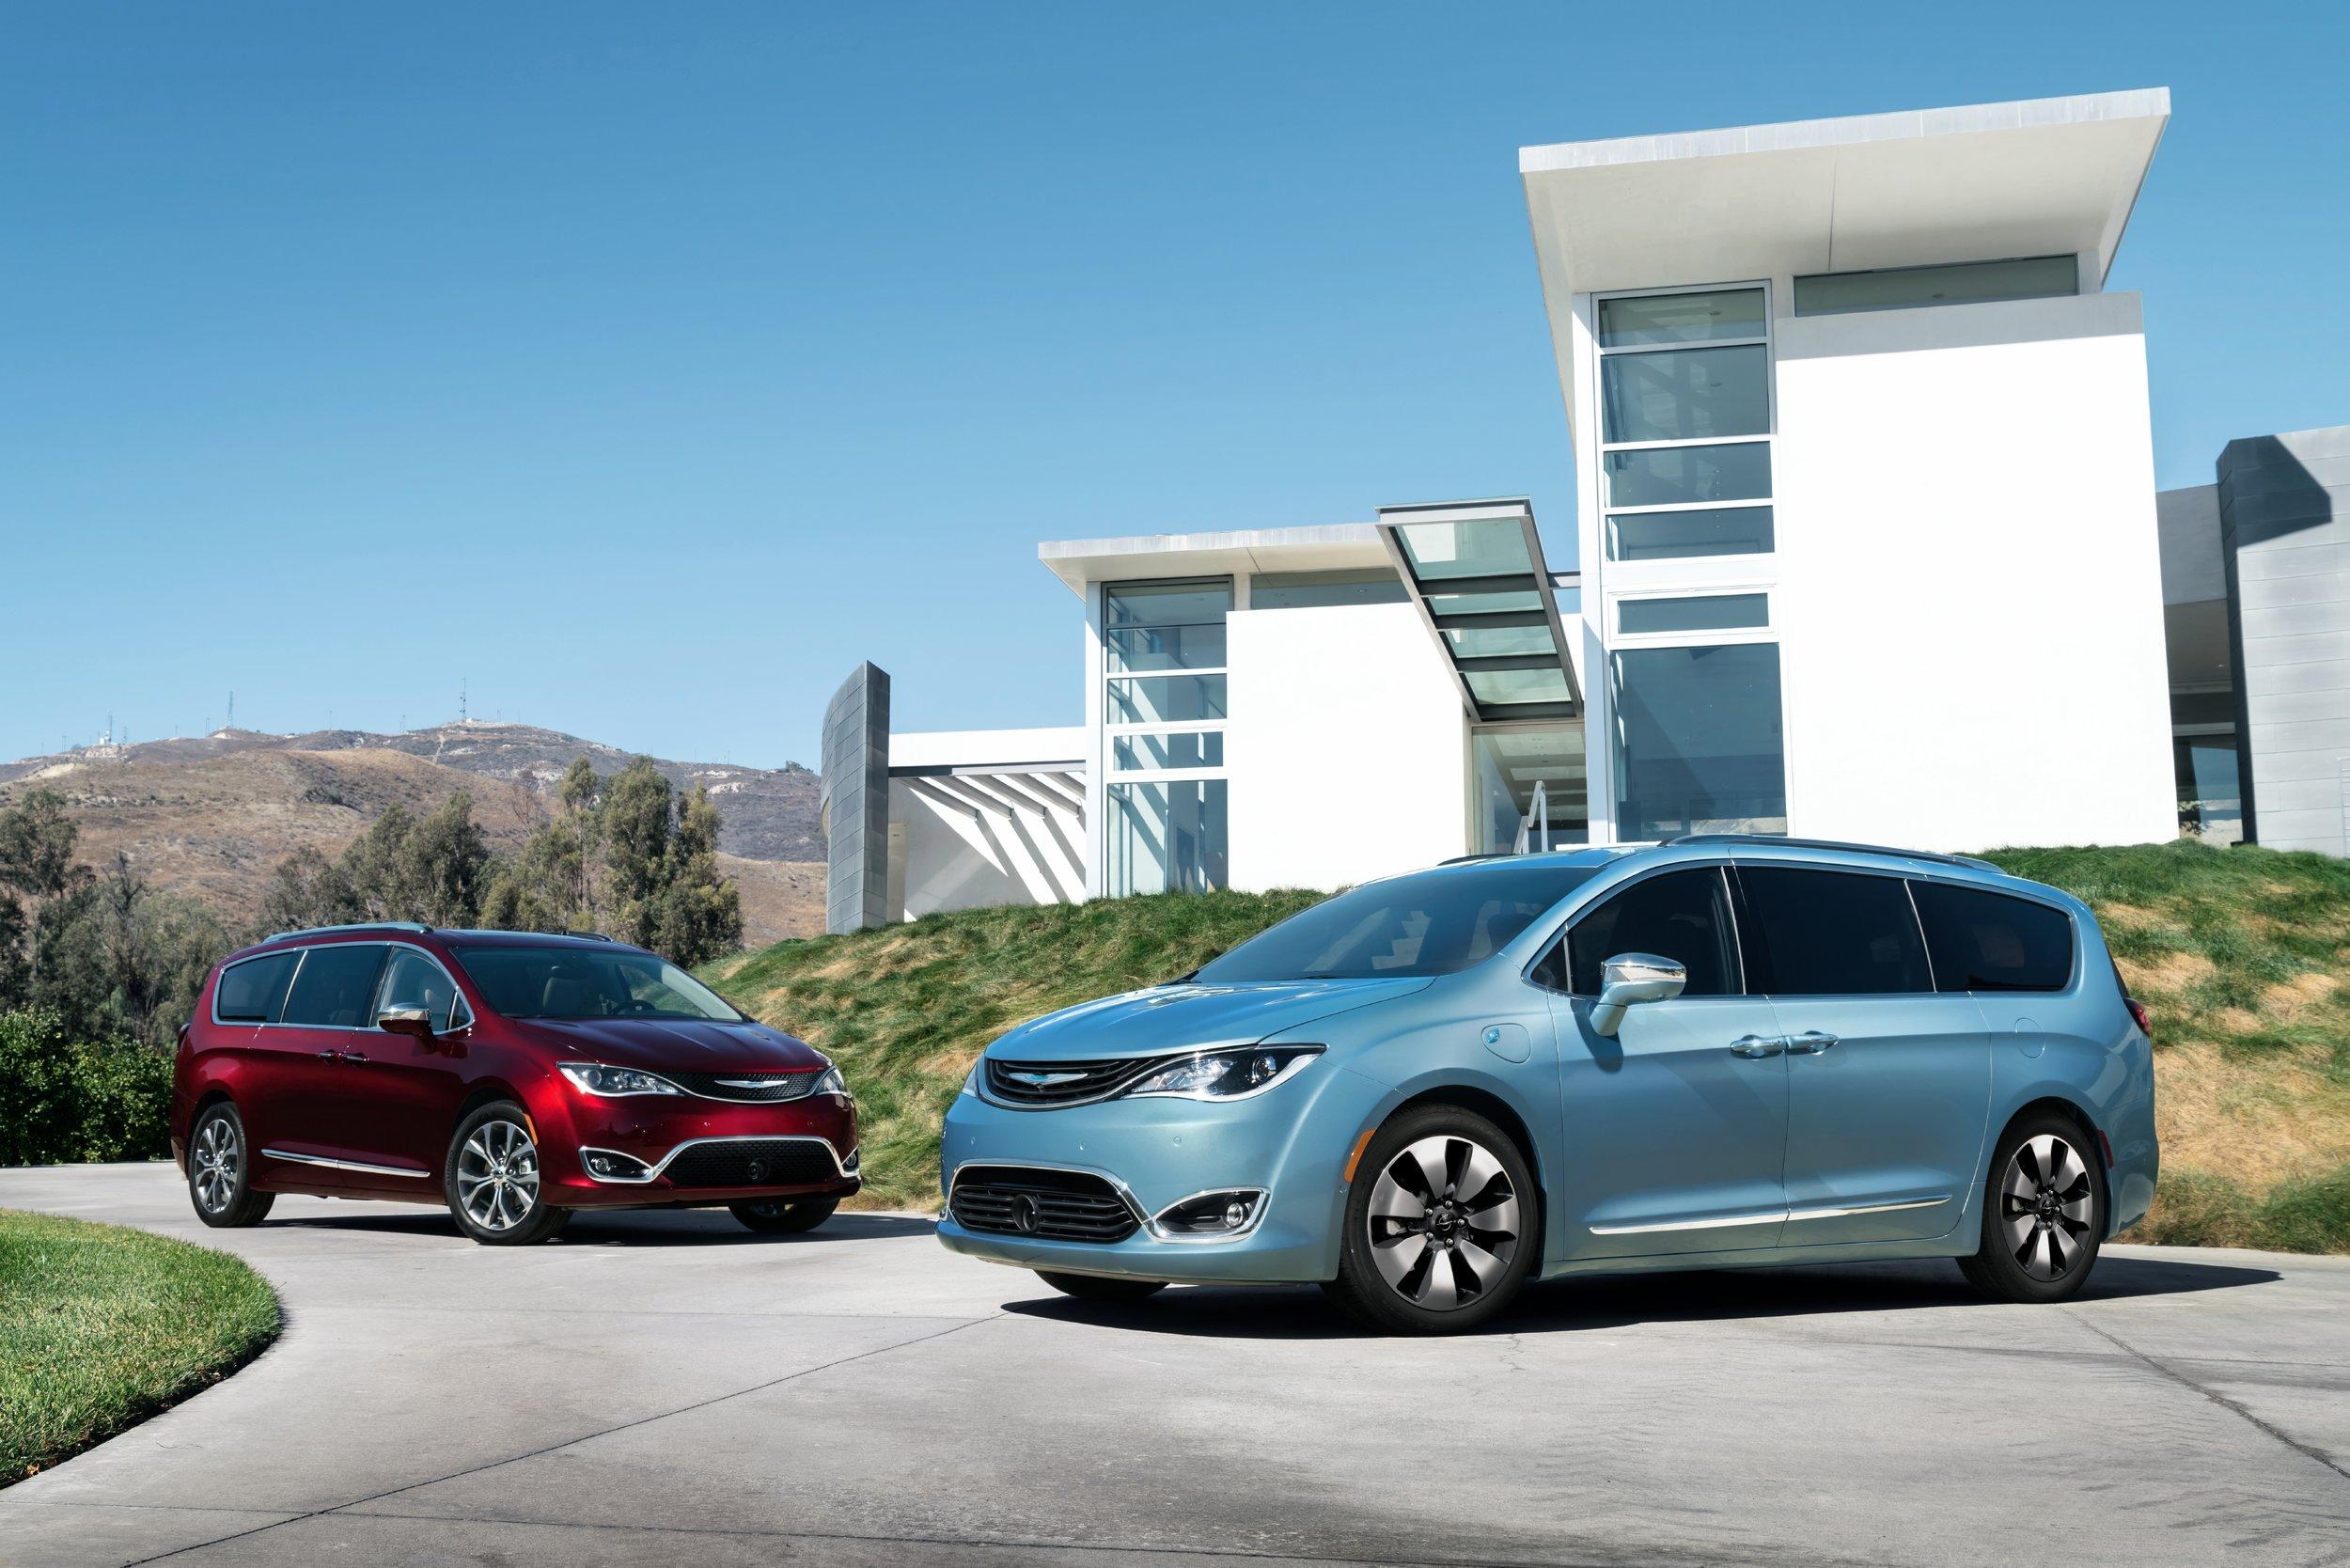 2017 Chrysler Pacifica Hybrid Minivan  on the right, Photo courtesy of Fiat Chrysler Automobiles